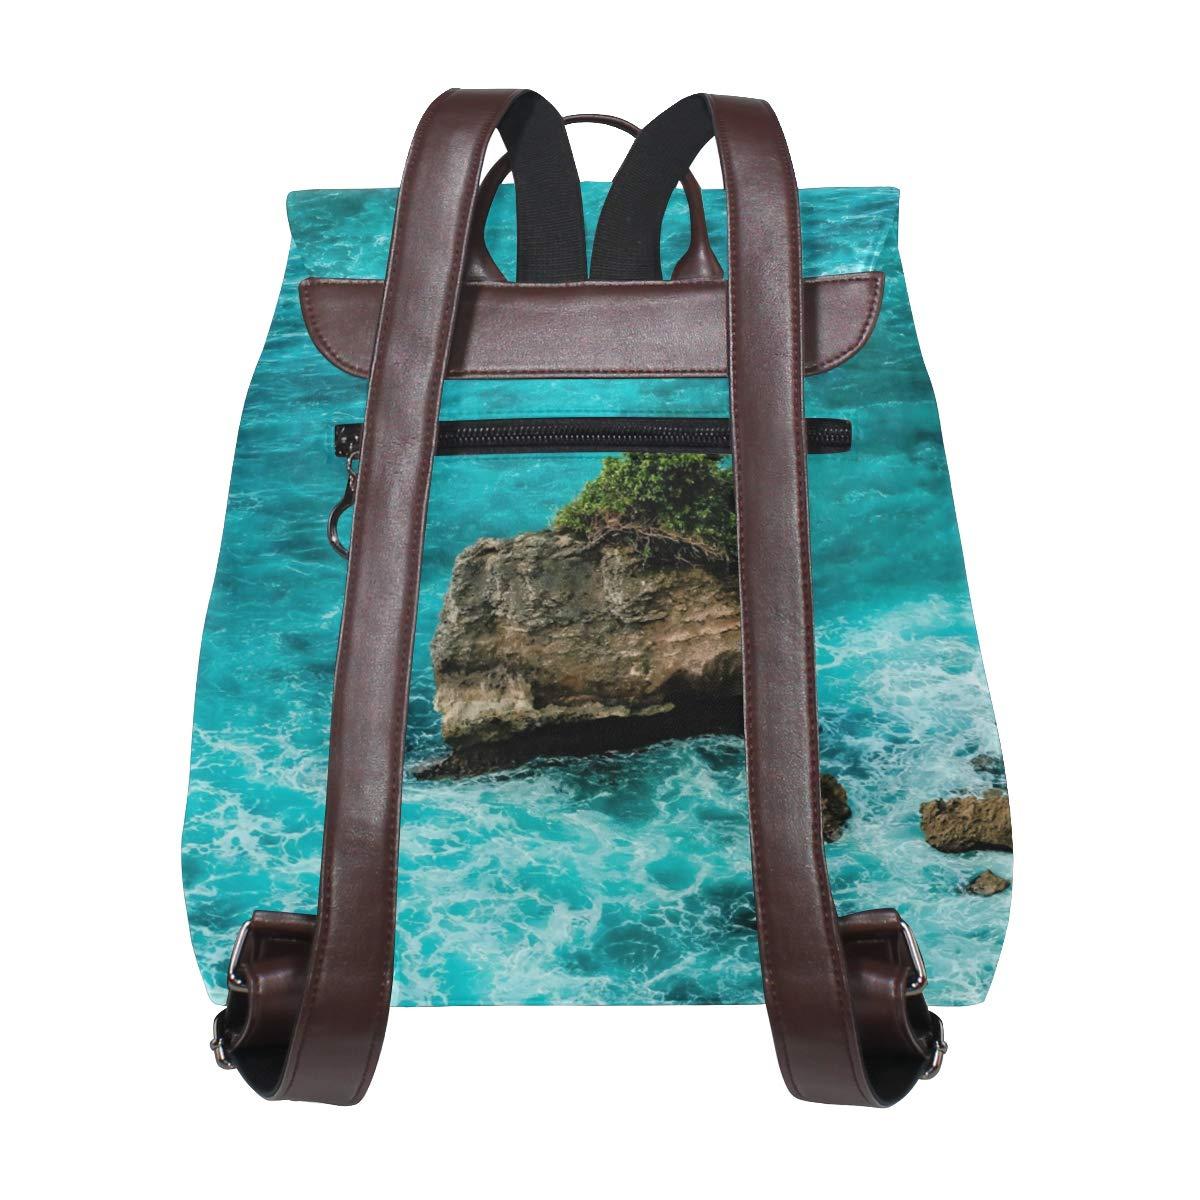 PU Leather Shoulder Bag,Bali Ocean Backpack,Portable Travel School Rucksack,Satchel with Top Handle